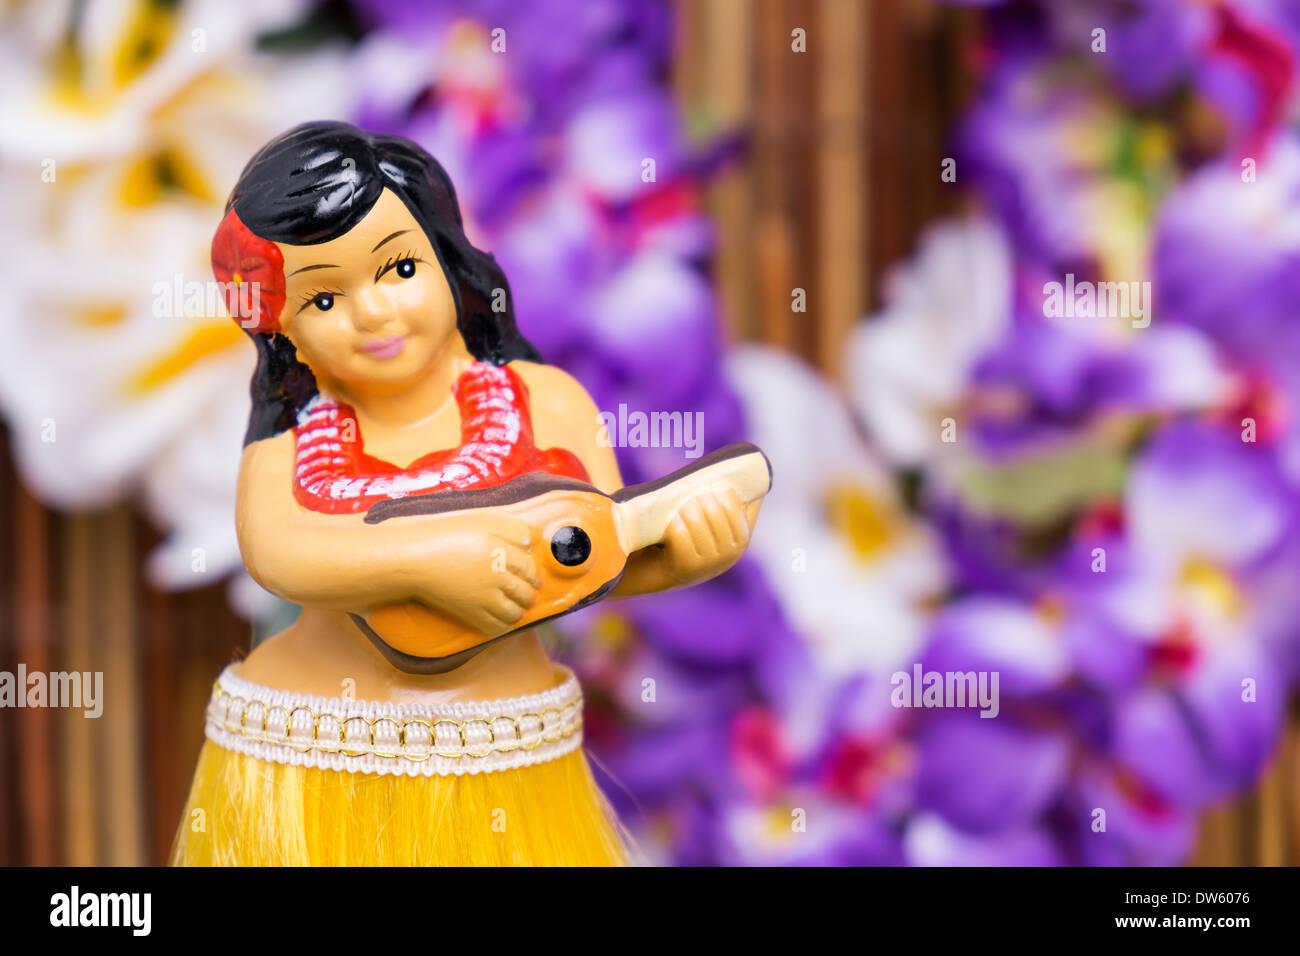 Tropical setting for a Hula girl doll - Stock Image